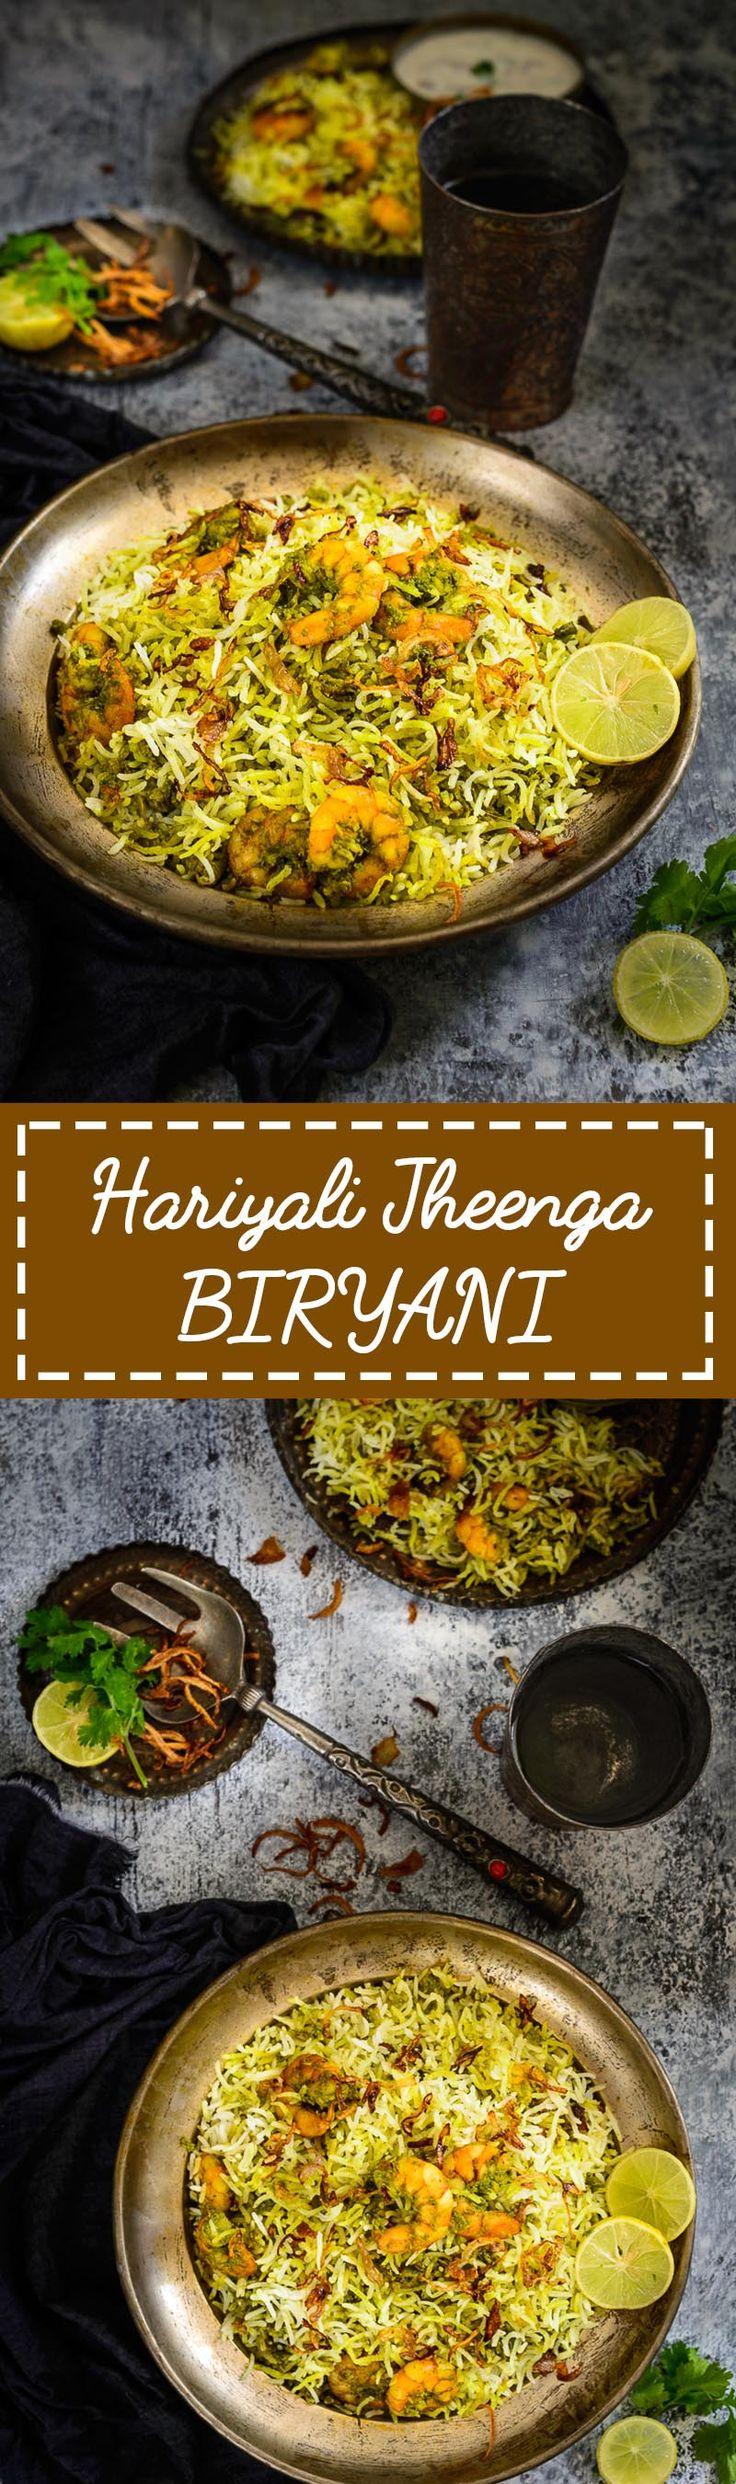 Hariyali Jheenga Biryani. Prawn biryani cooked in a  spicy green masala. Food Photography and styling by Neha Mathur.